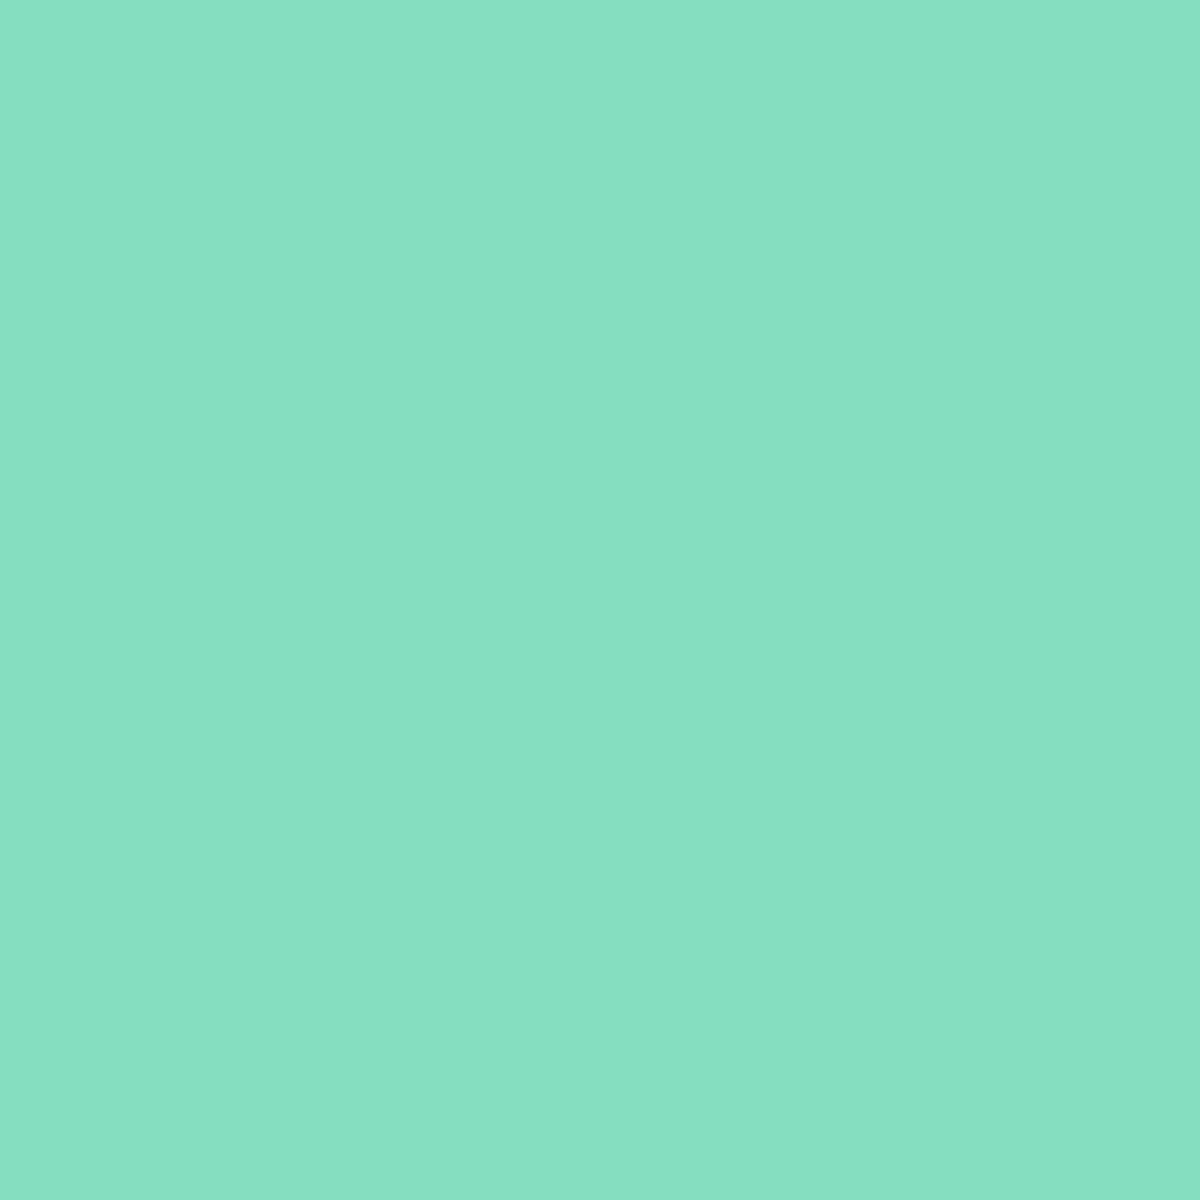 Виниловая самоклеющаяся пленка (глянец) G-3230 (1,06м х45,7м)